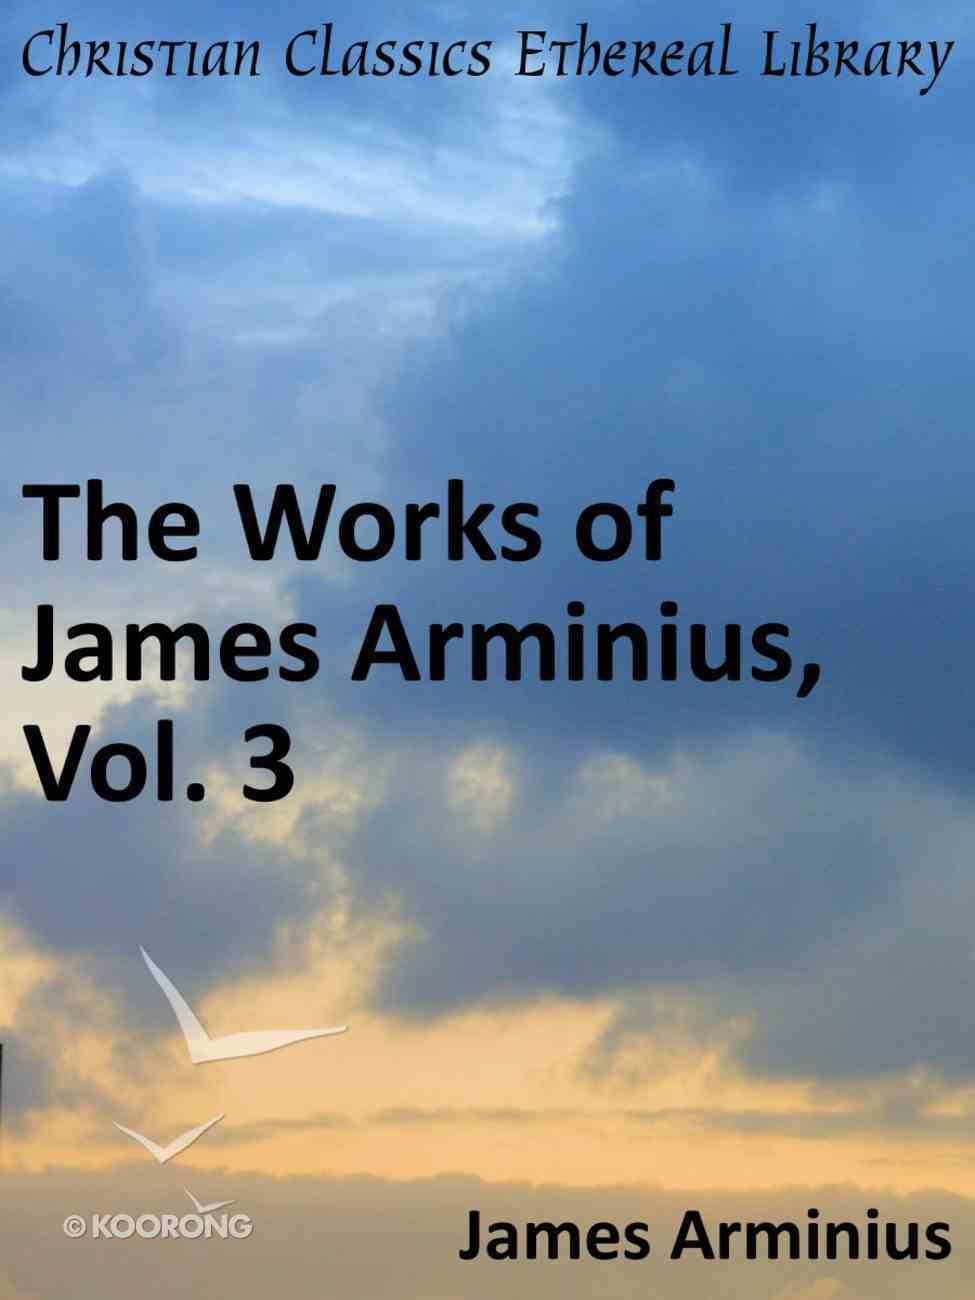 Works of James Arminius (Vol 3) eBook